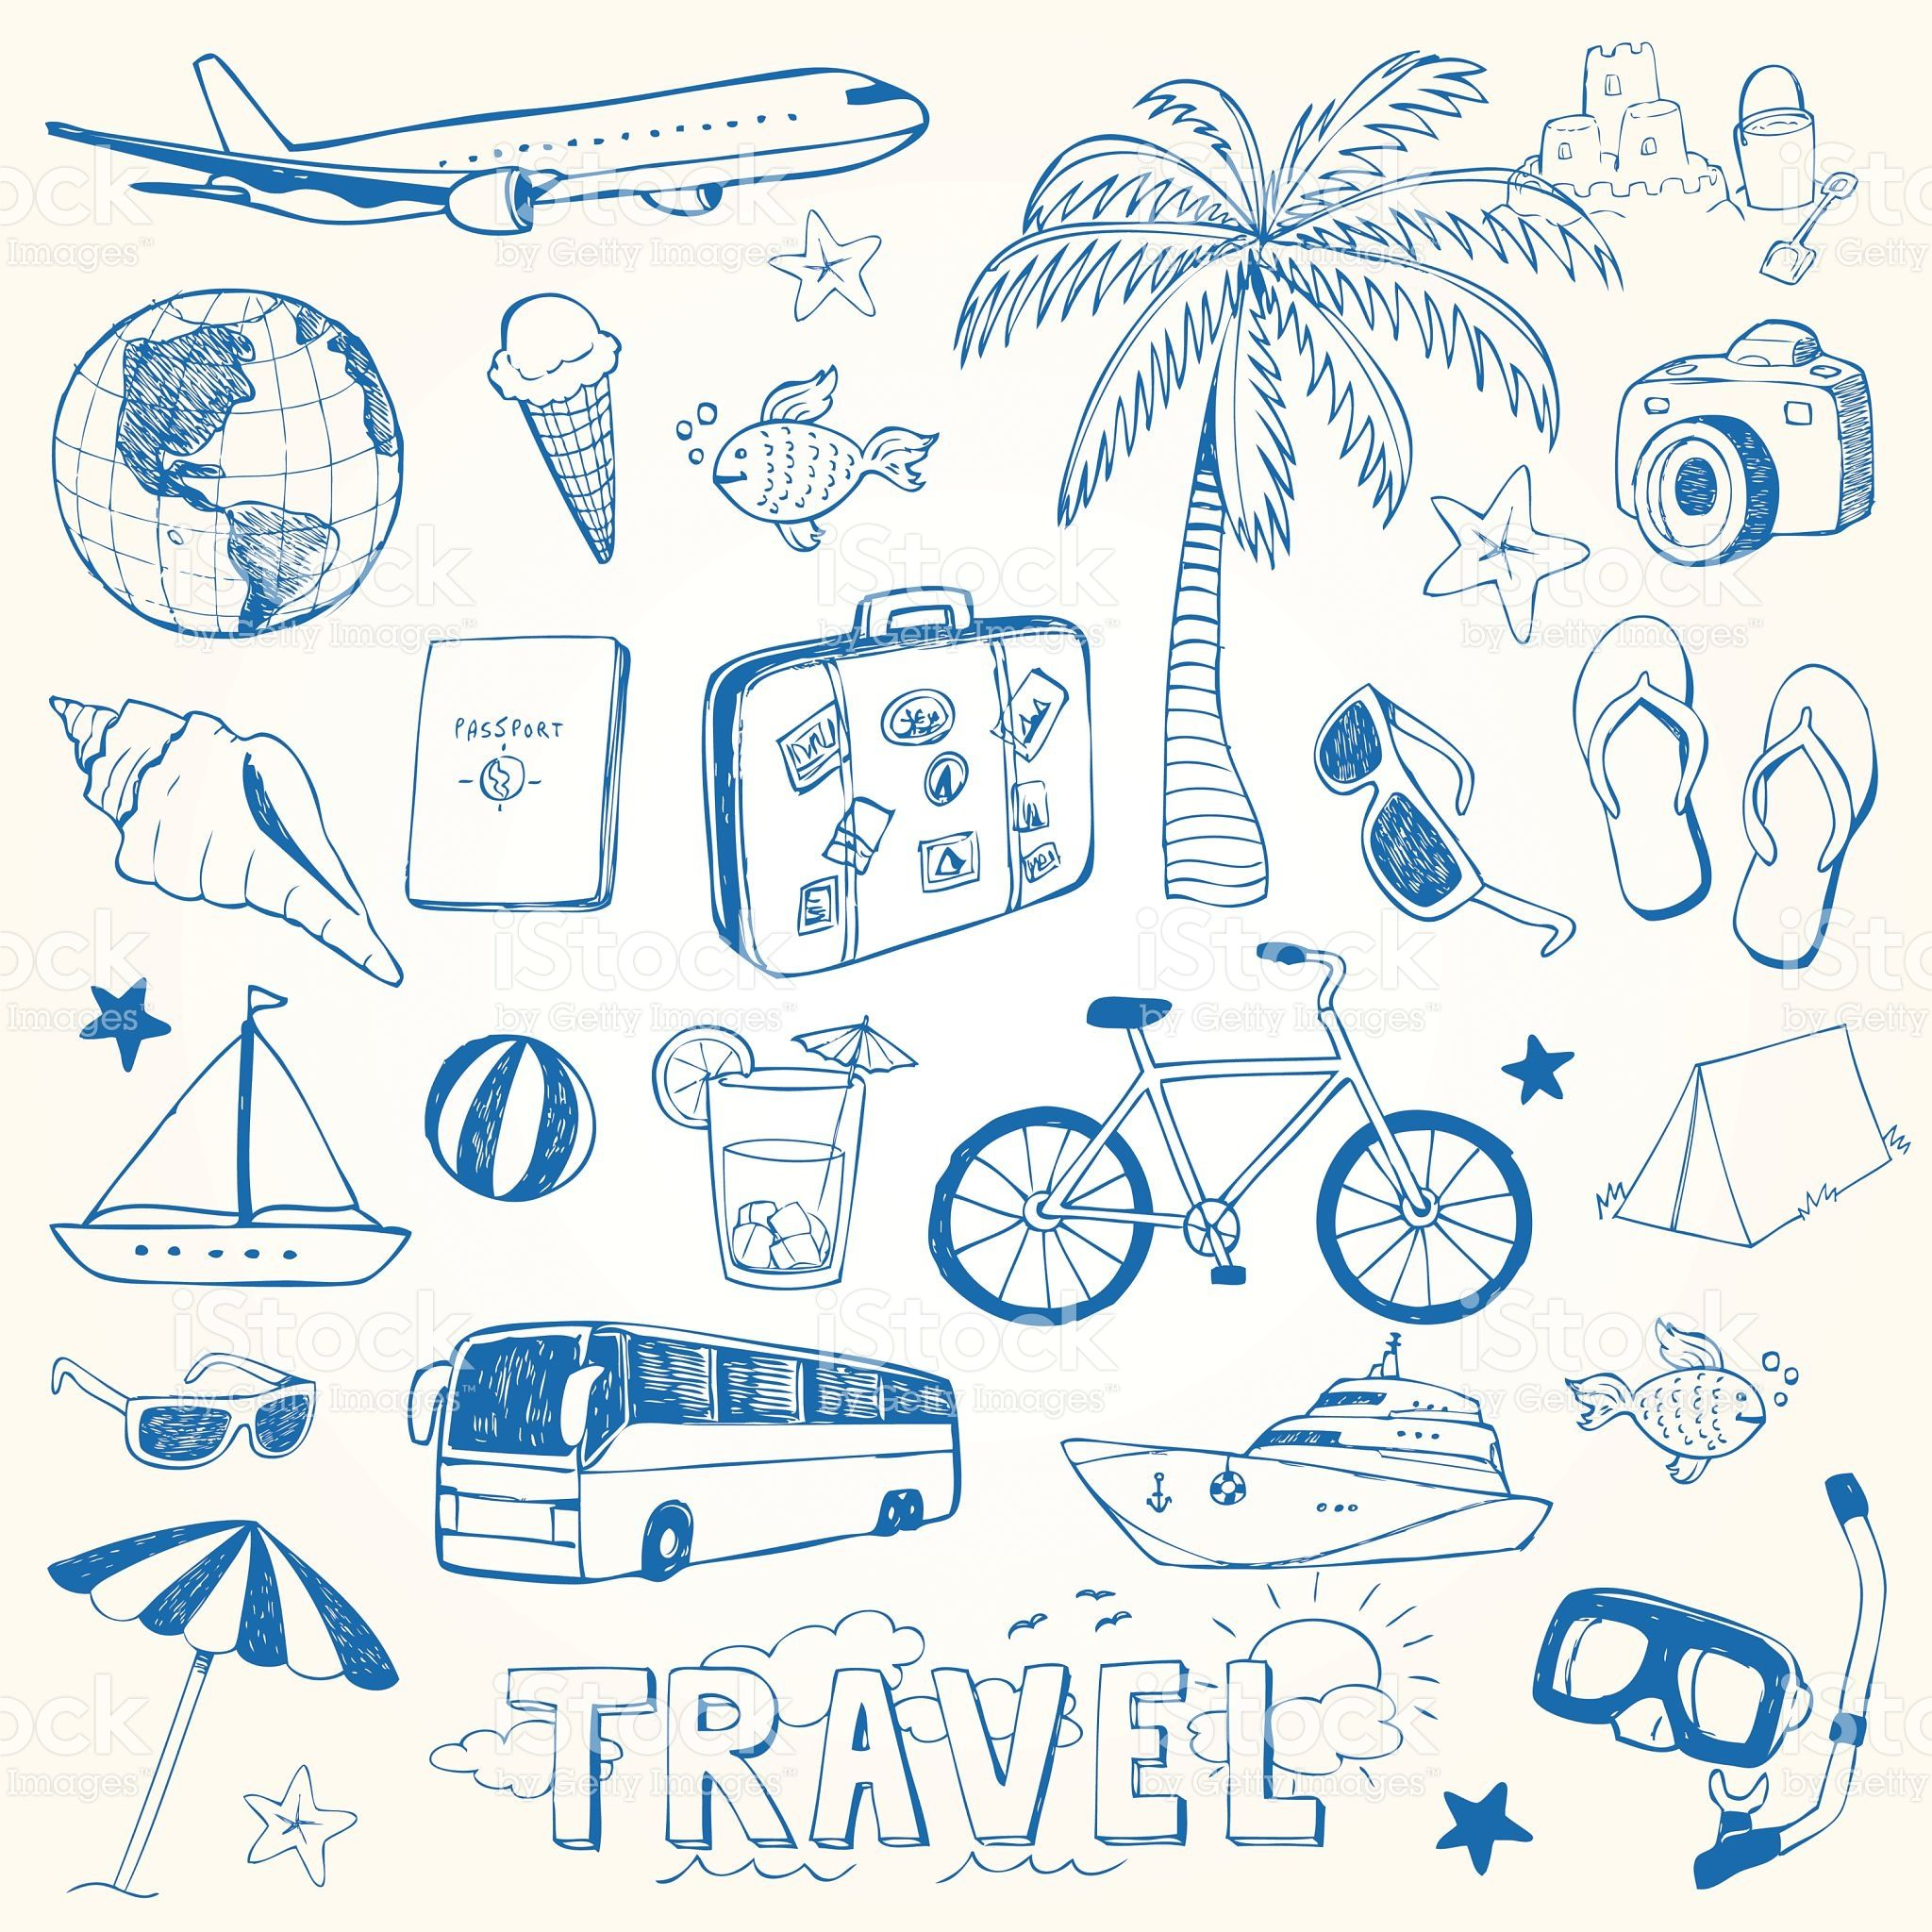 Hand drawn travel doodles vector illustration set is part of Hand Drawn Doodle Travel Set Vector Illustration - Hand drawn travel doodles vector illustration set